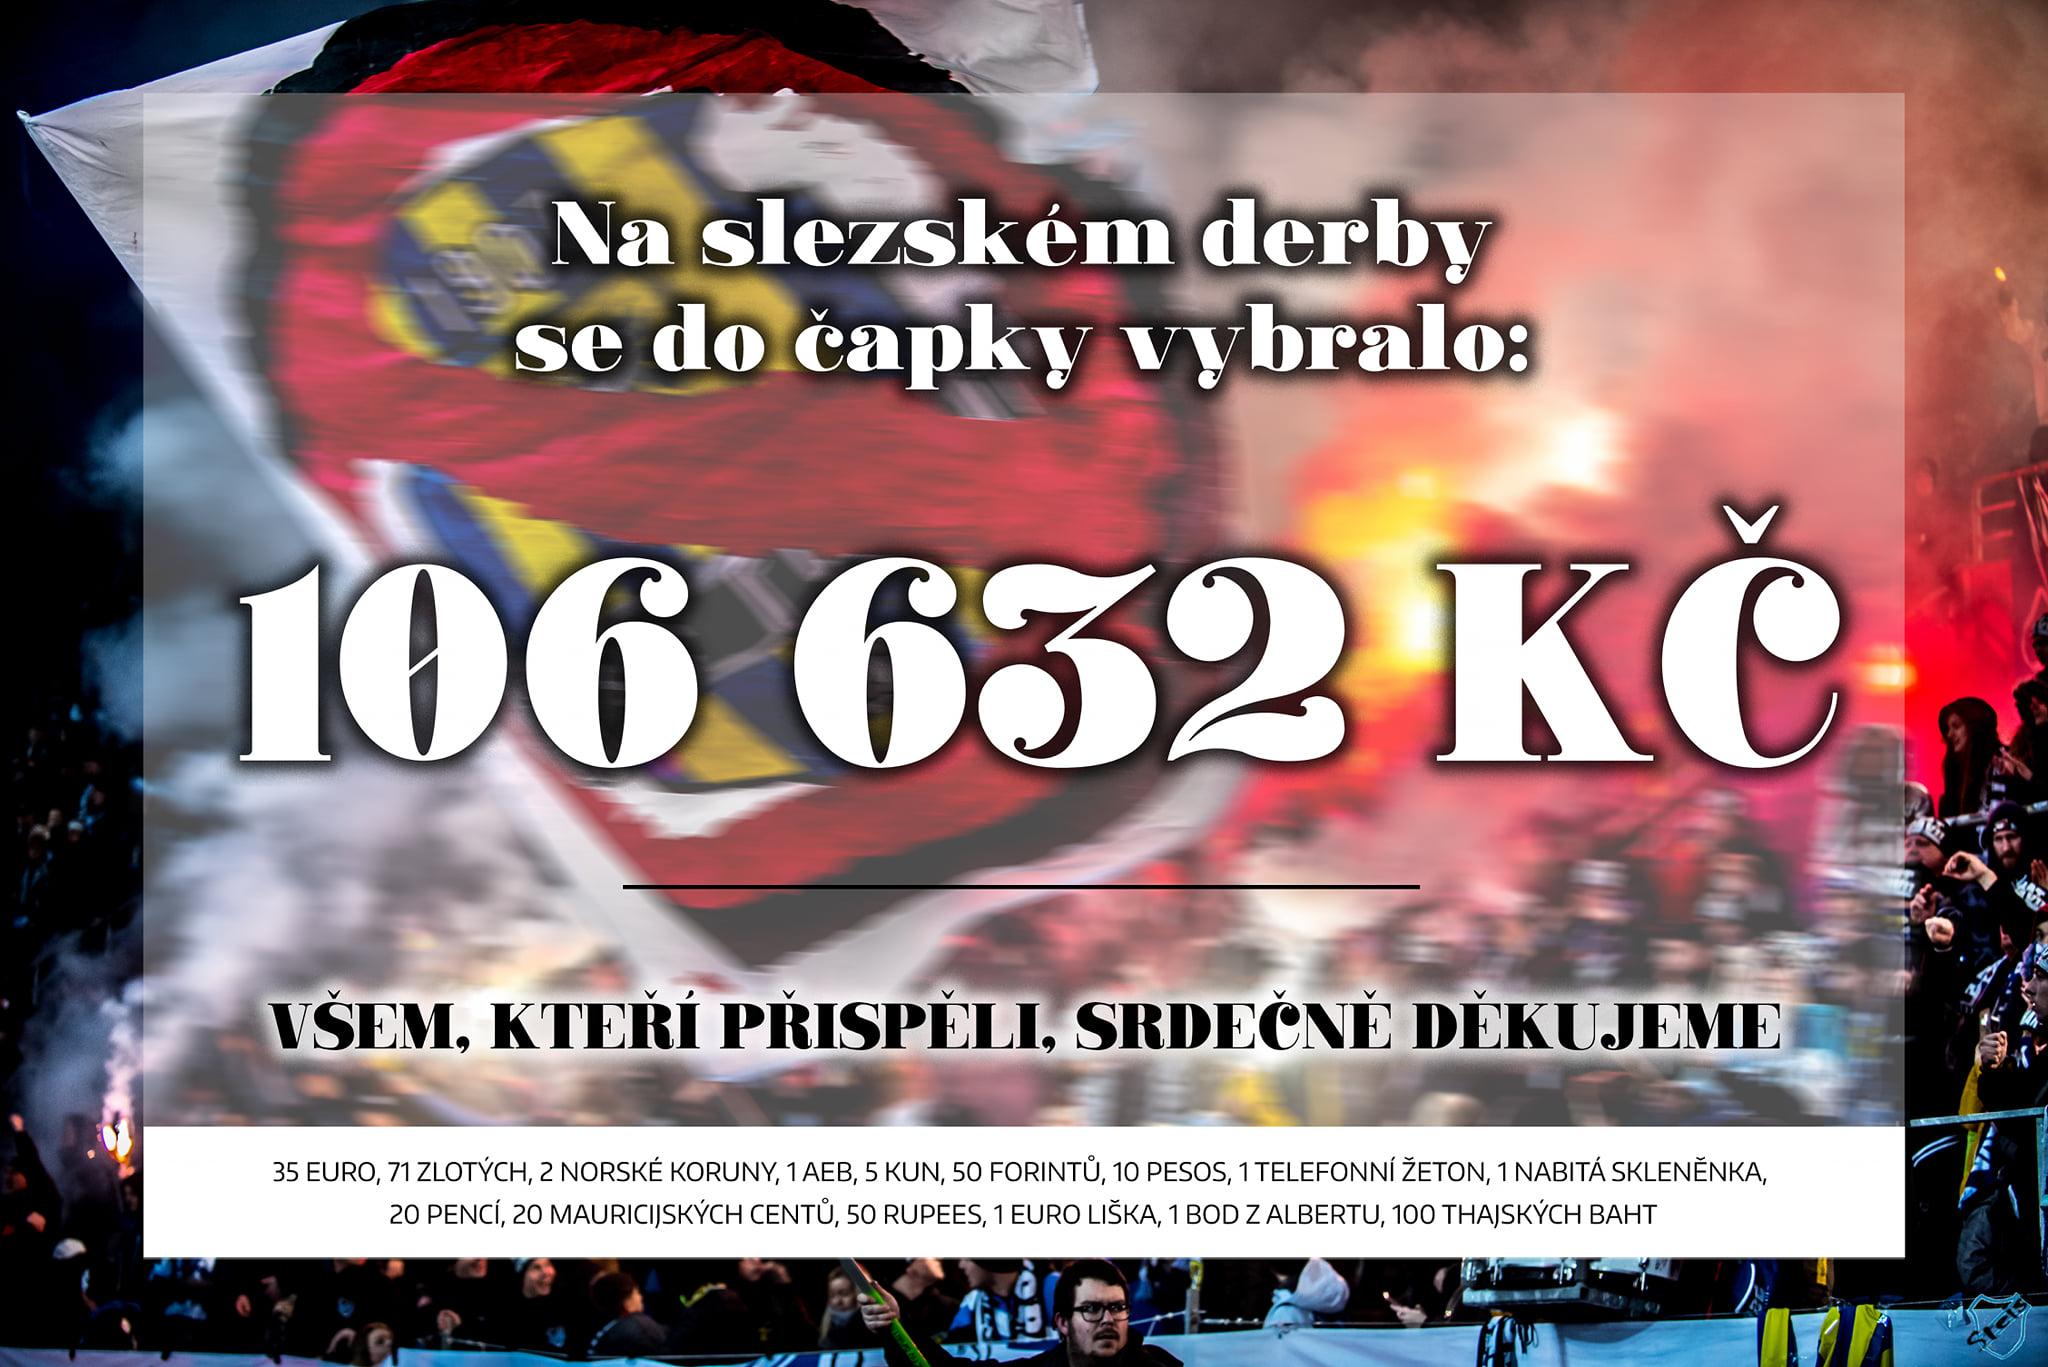 fcb_opava_19-20_5.jpg (413 KB)